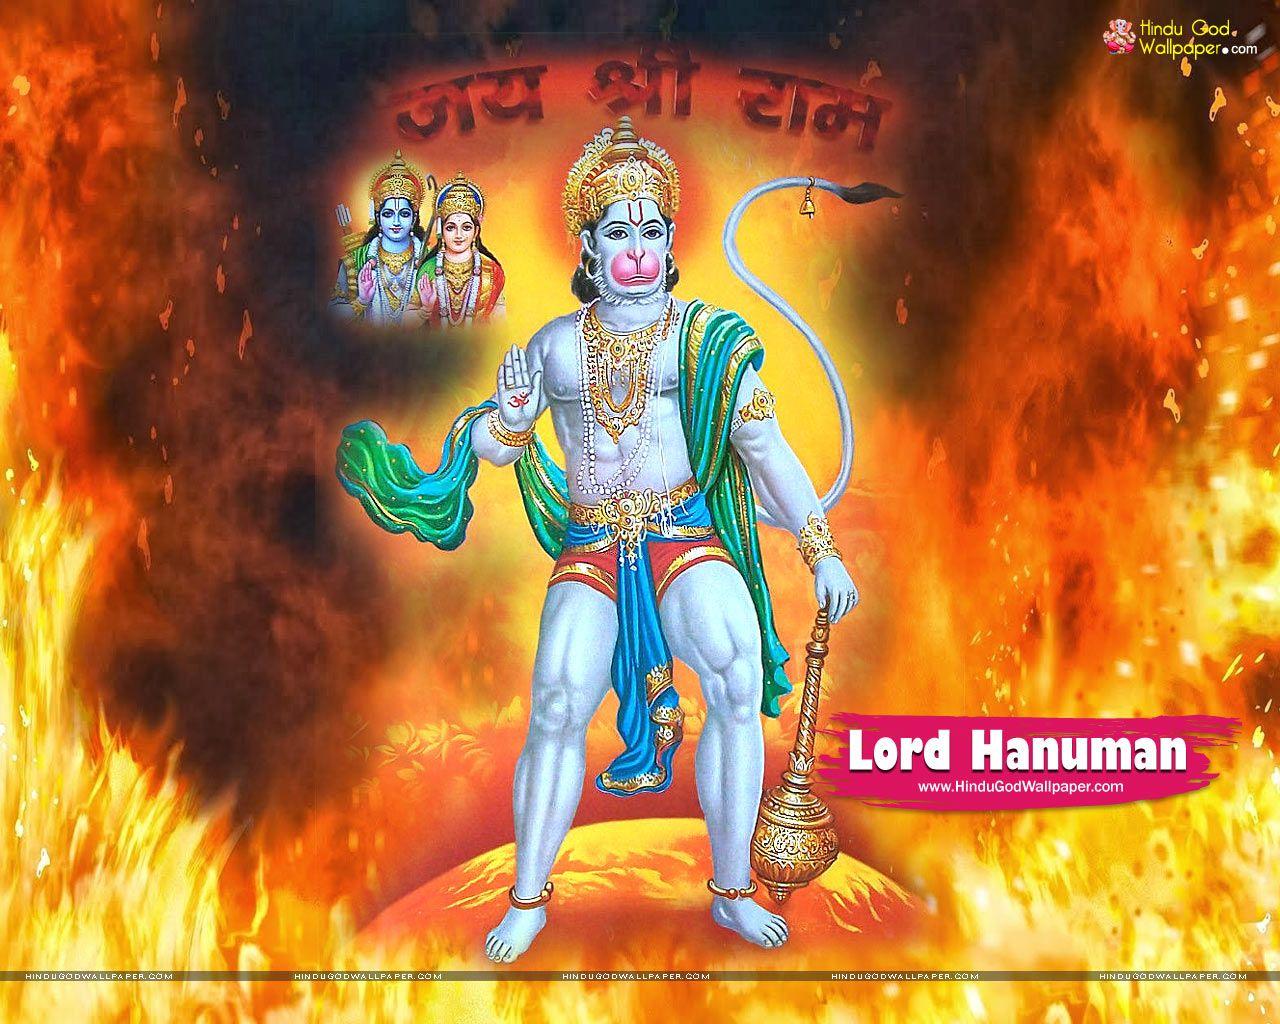 Hd wallpaper hanuman - Angry Hanuman Wallpapers Hd Wallpaper Download